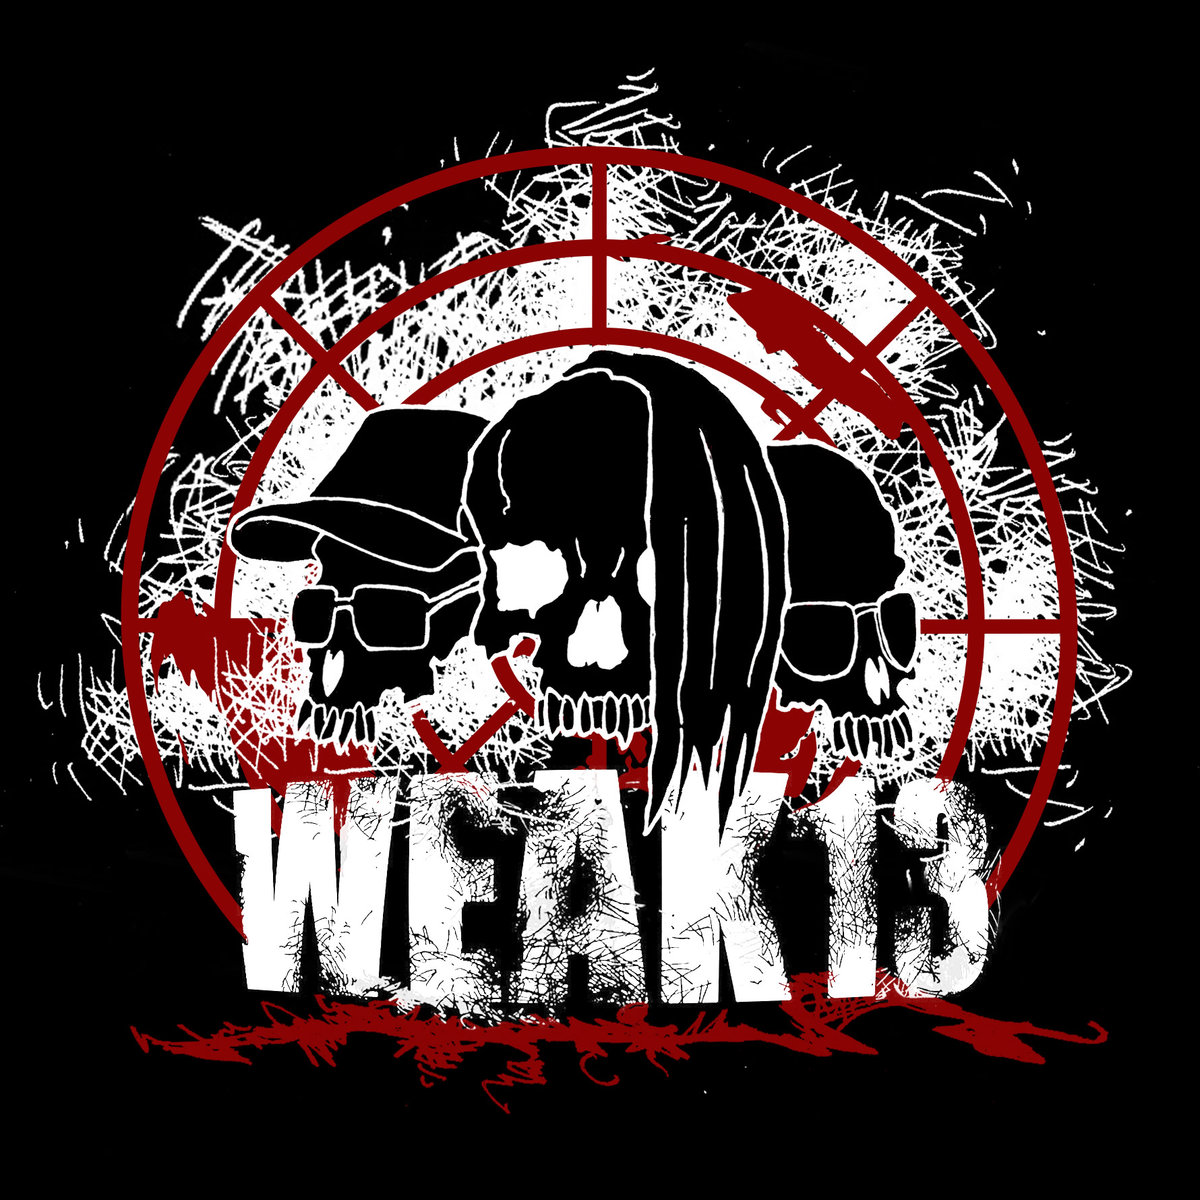 Weak13 Pics, Music Collection